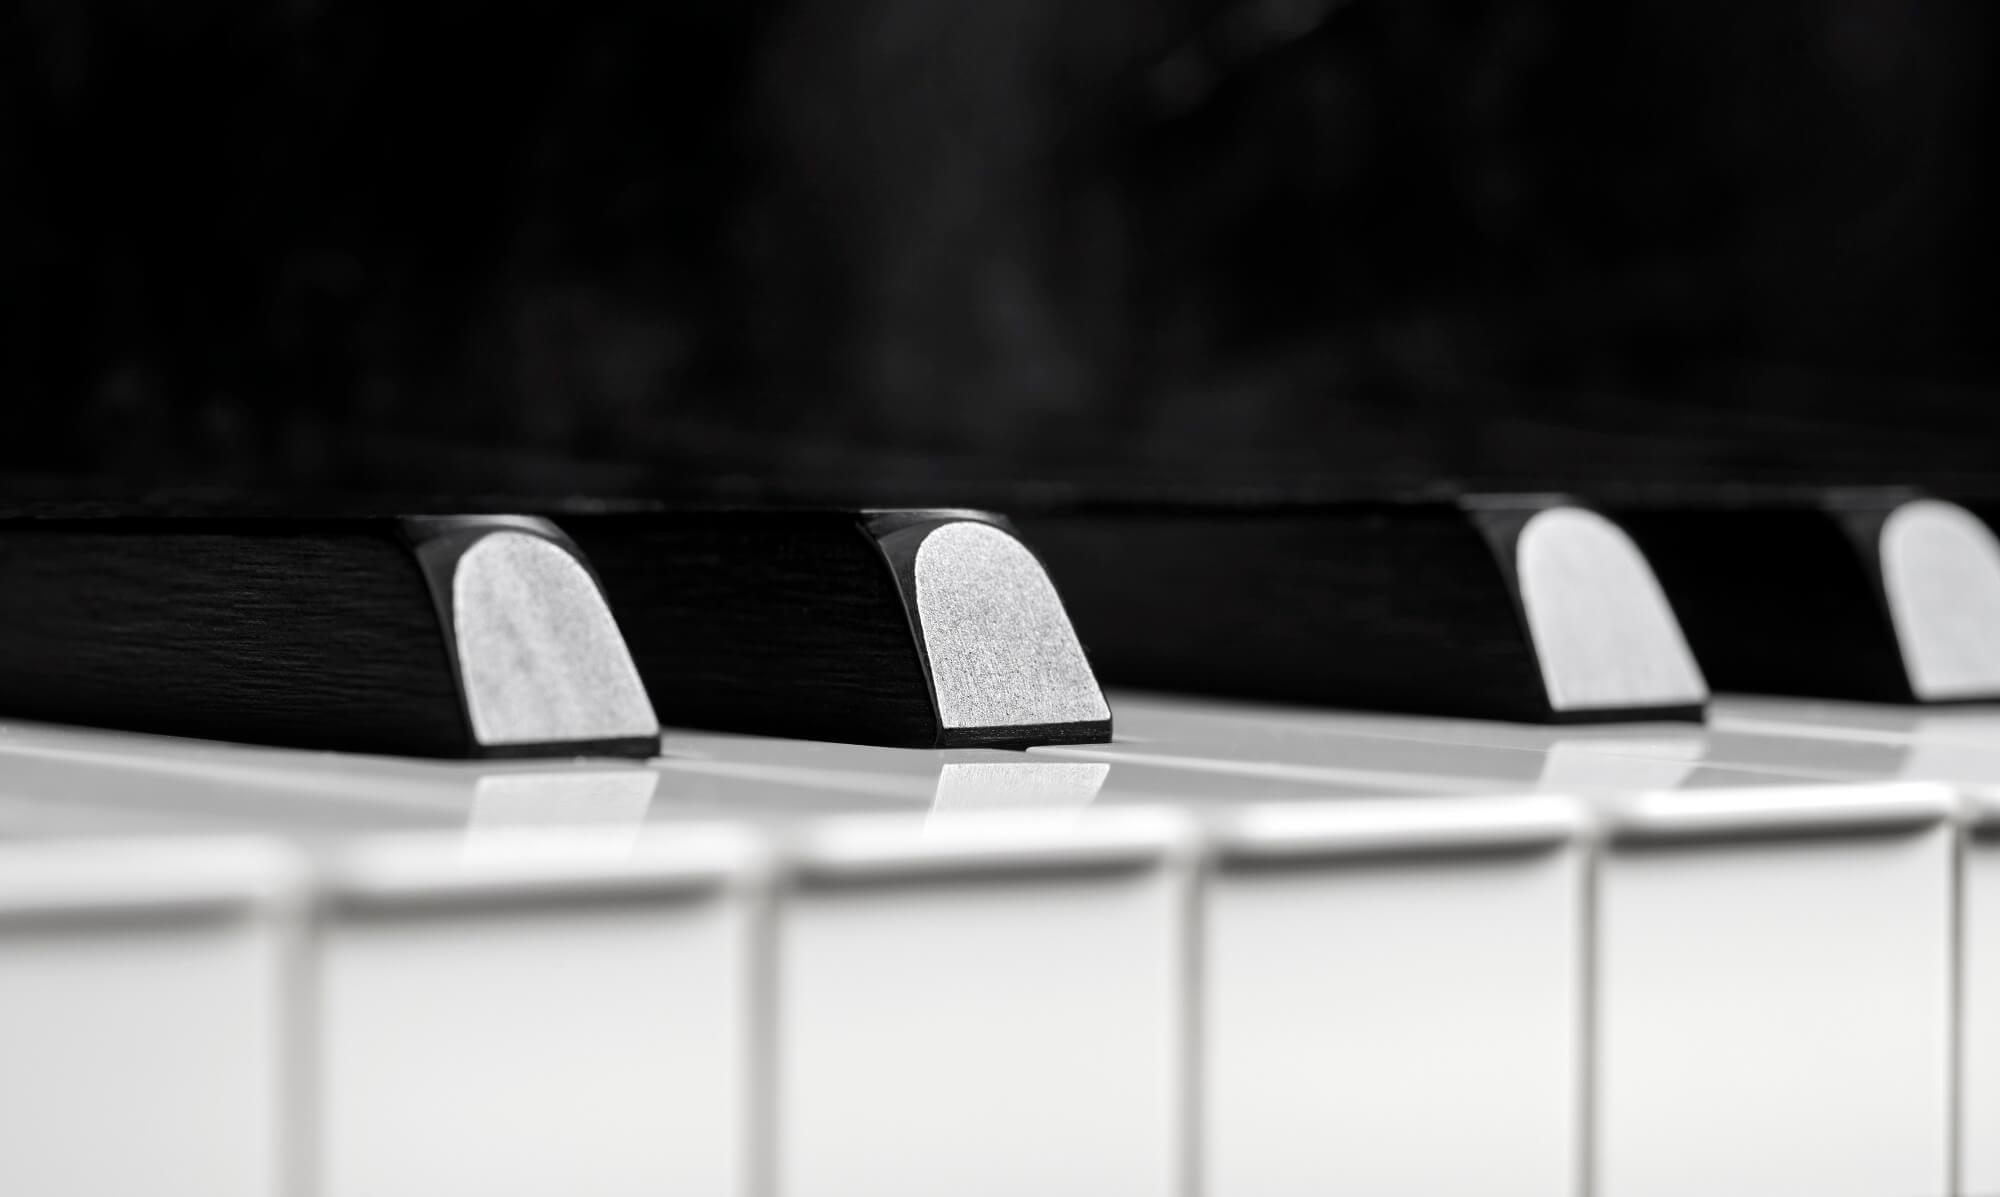 Piano's Image